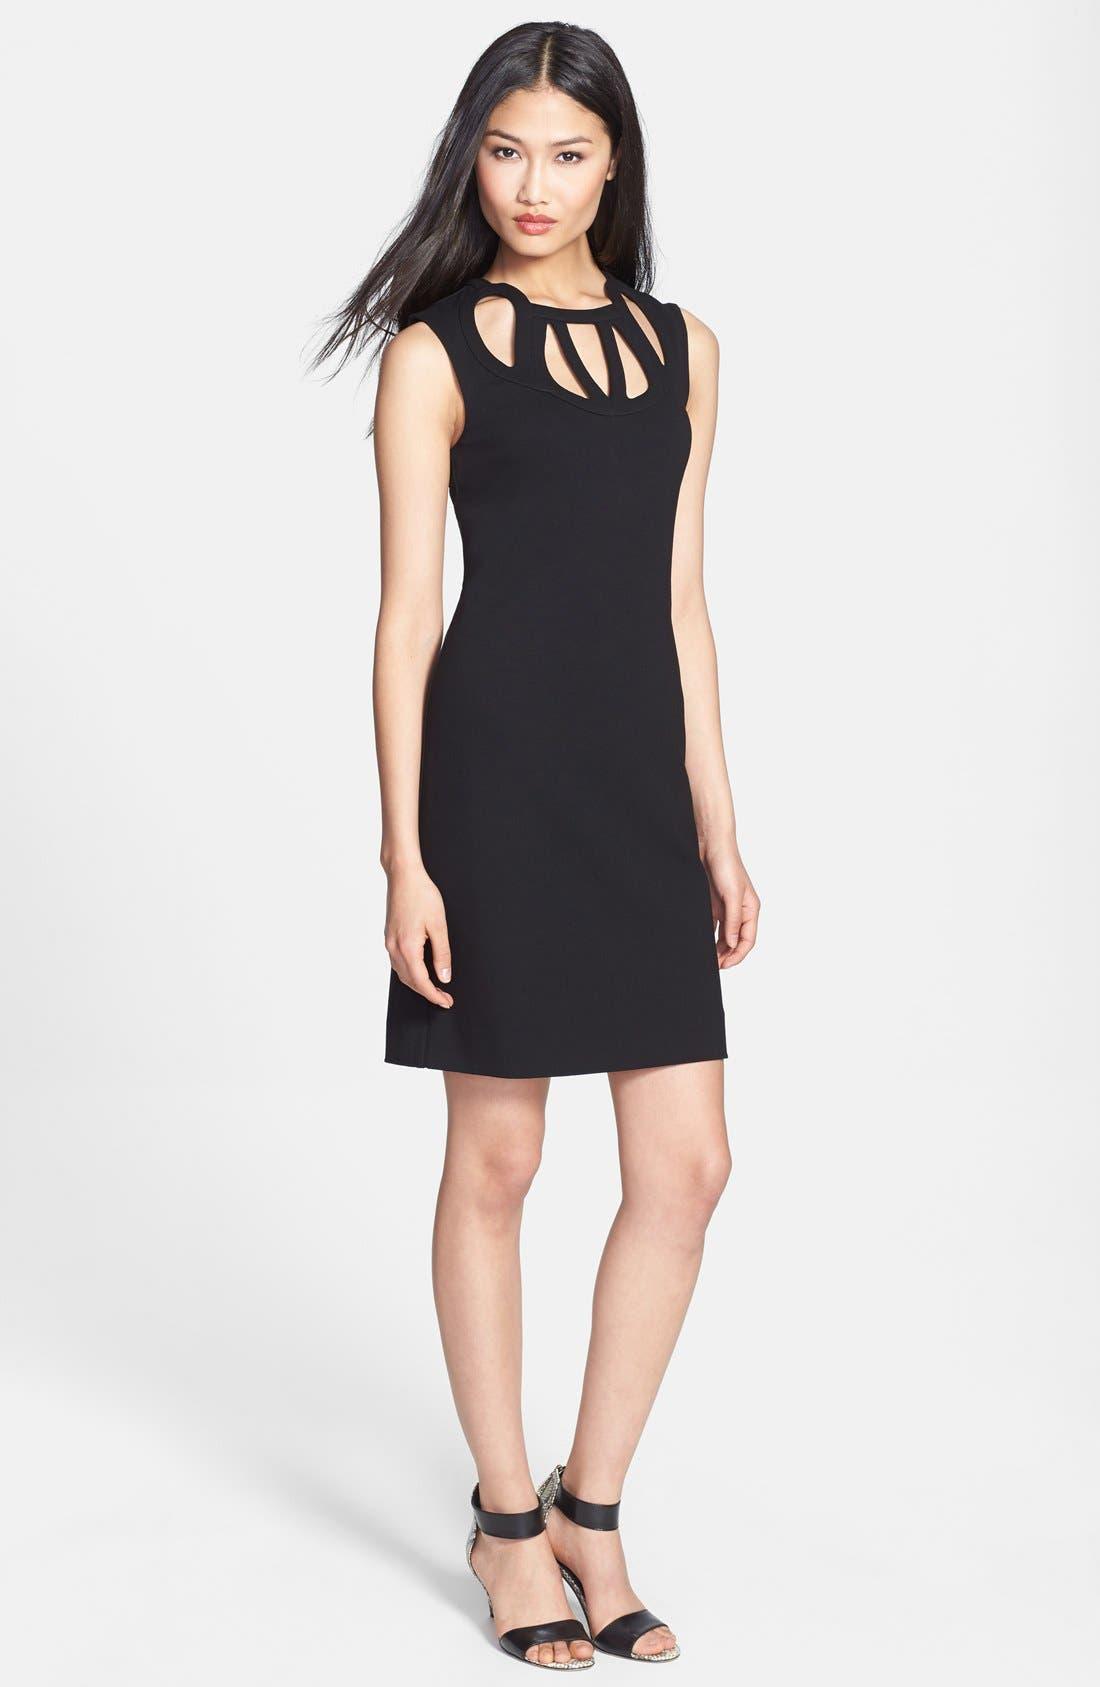 Alternate Image 1 Selected - Diane von Furstenberg 'Amy' Knit Sheath Dress